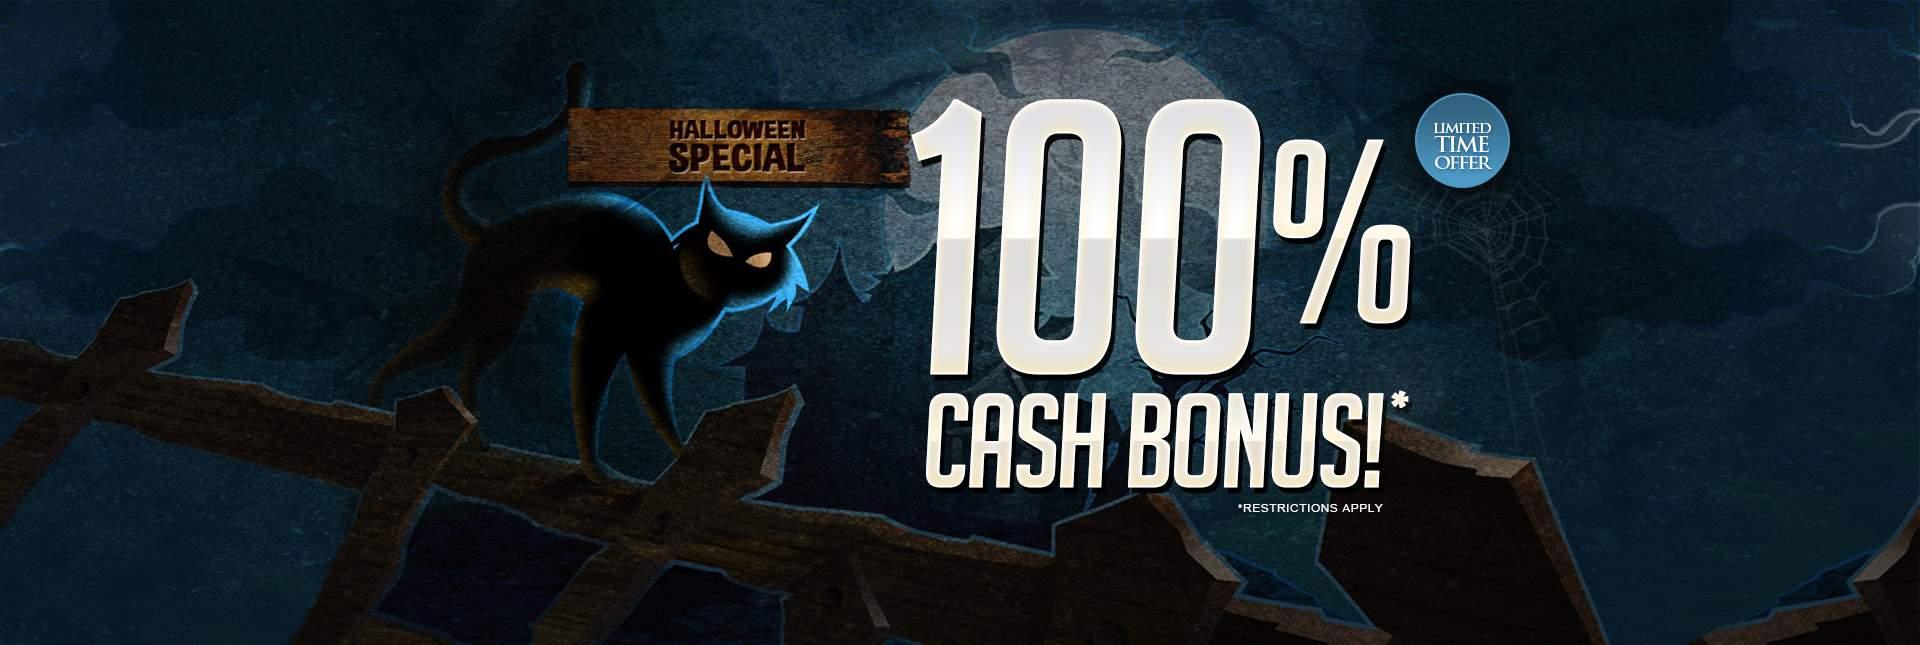 Halloween Special: 100% Cash Bonus!